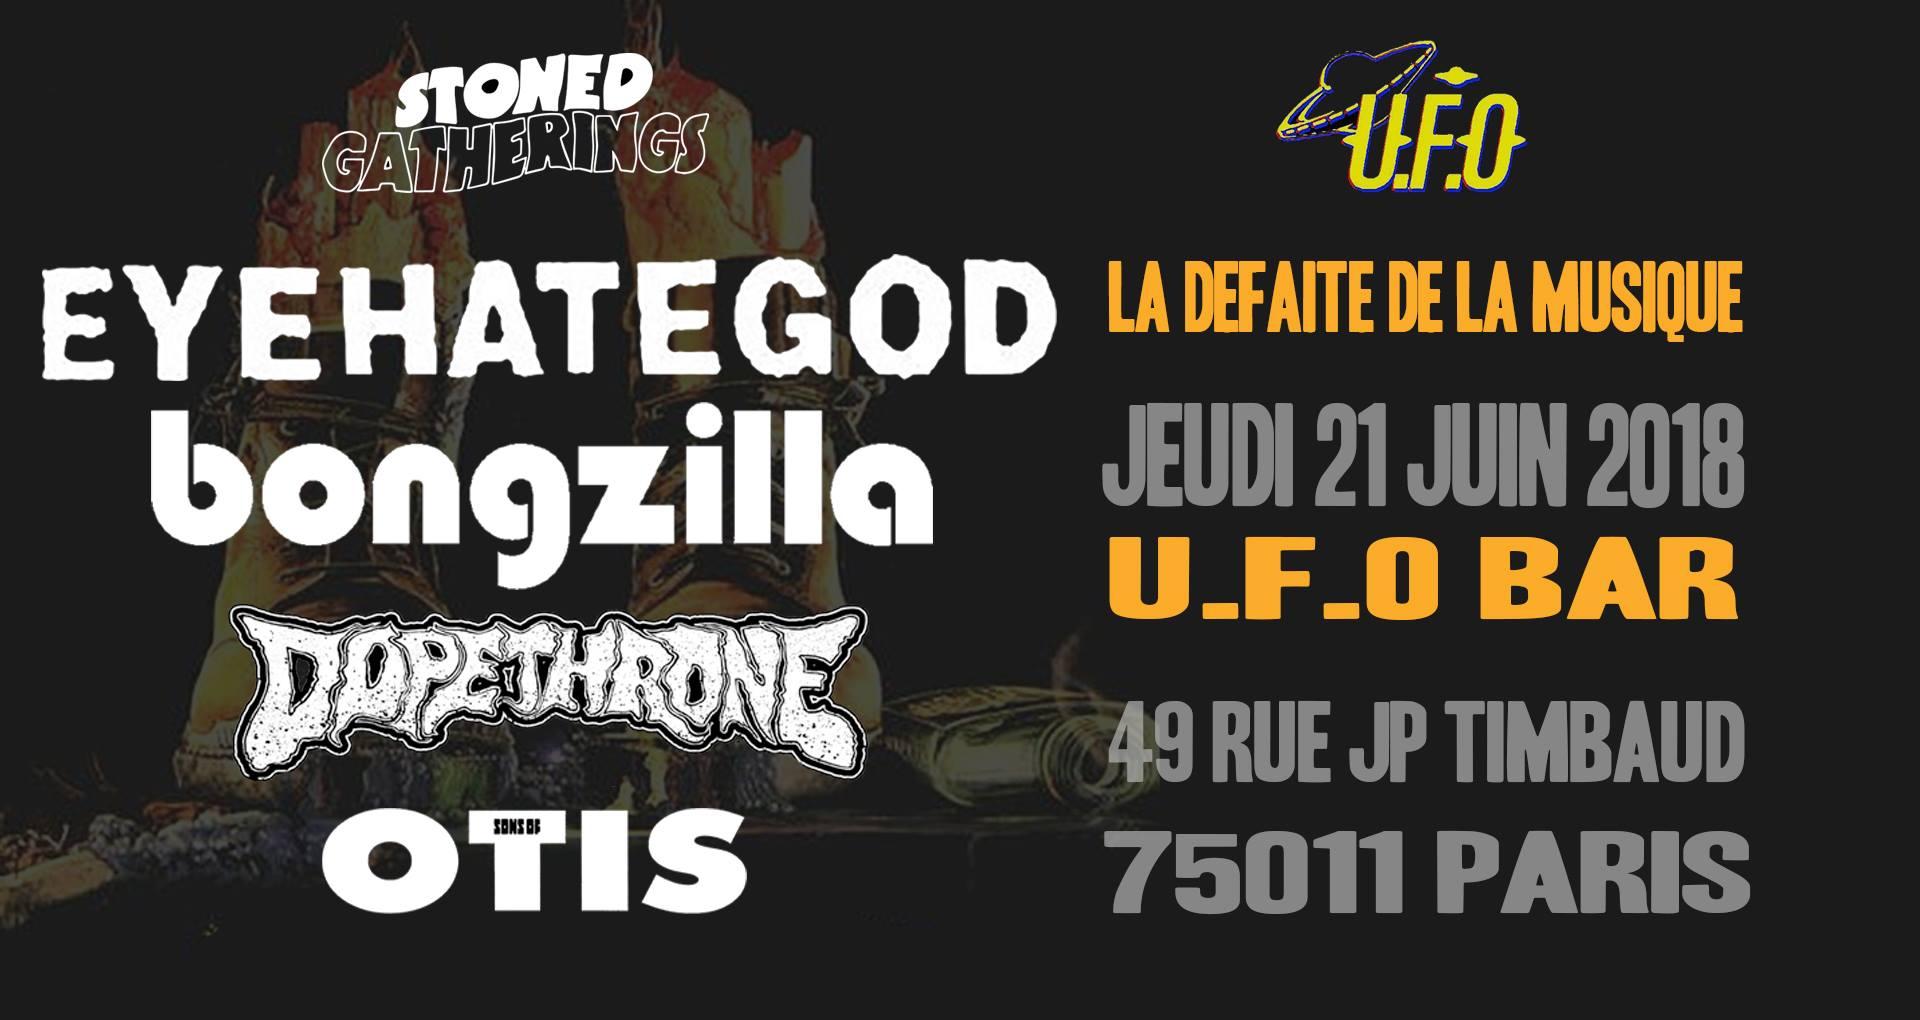 La défaite de la Musique w/ Eyehategod + Bongzilla + Dopethrone + Sons Of Otis @ U.F.O. Bar (Paris), le 21 Juin 2018